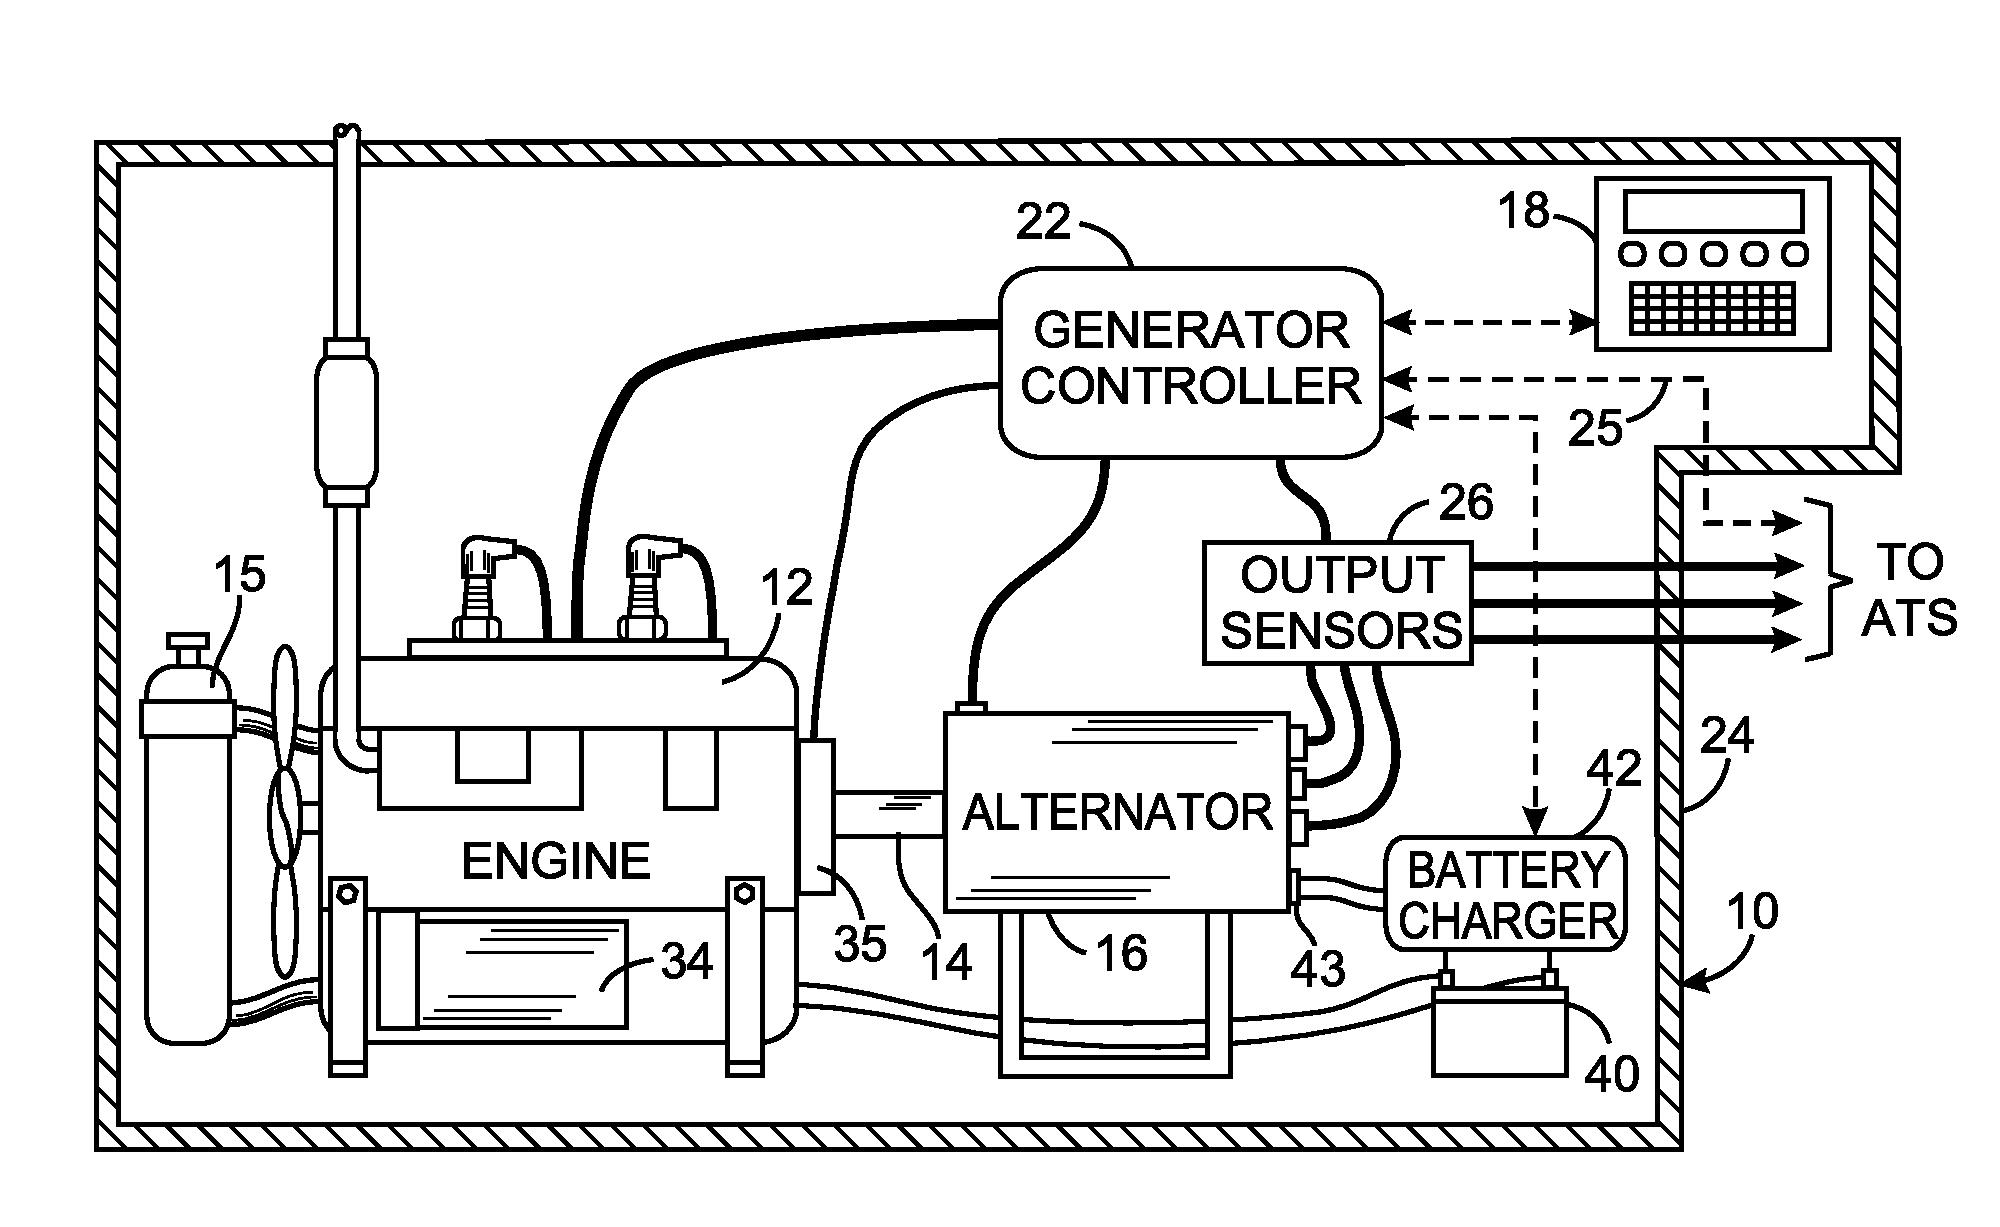 hight resolution of 2000x1227 diesel generator block diagram